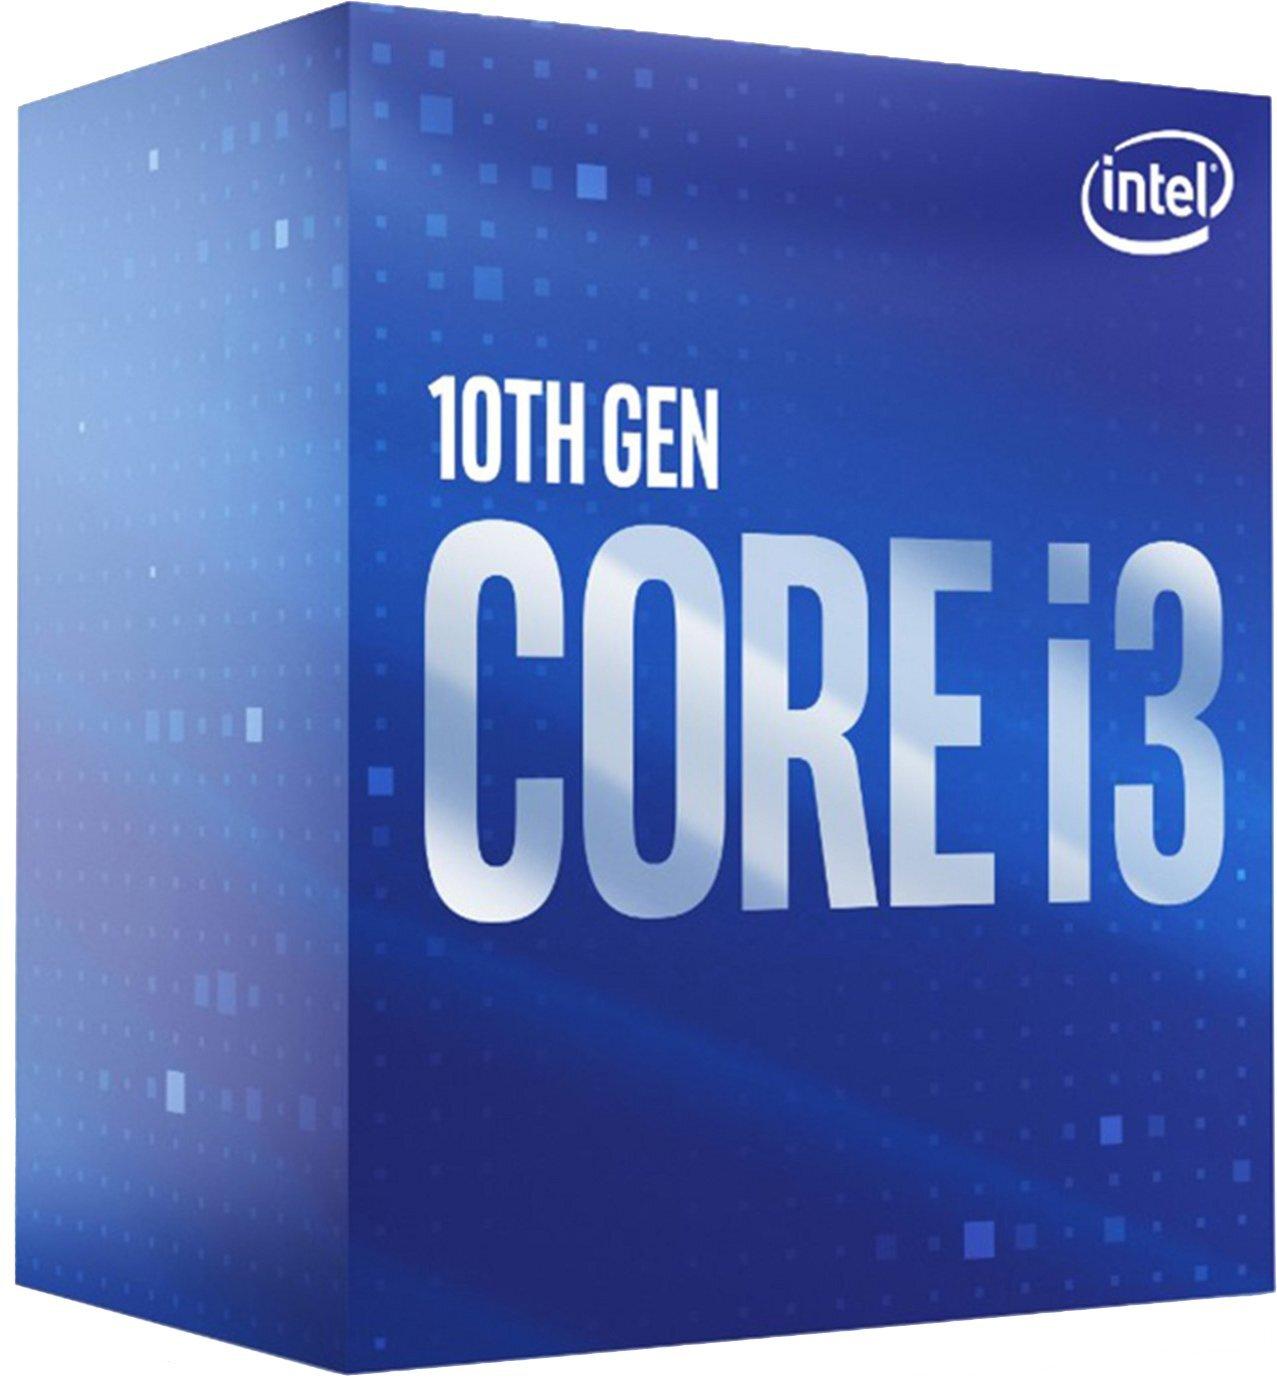 Процесор Intel Core i3-10105 4/8 3.7GHz 6M LGA1200 65W box (BX8070110105)фото1